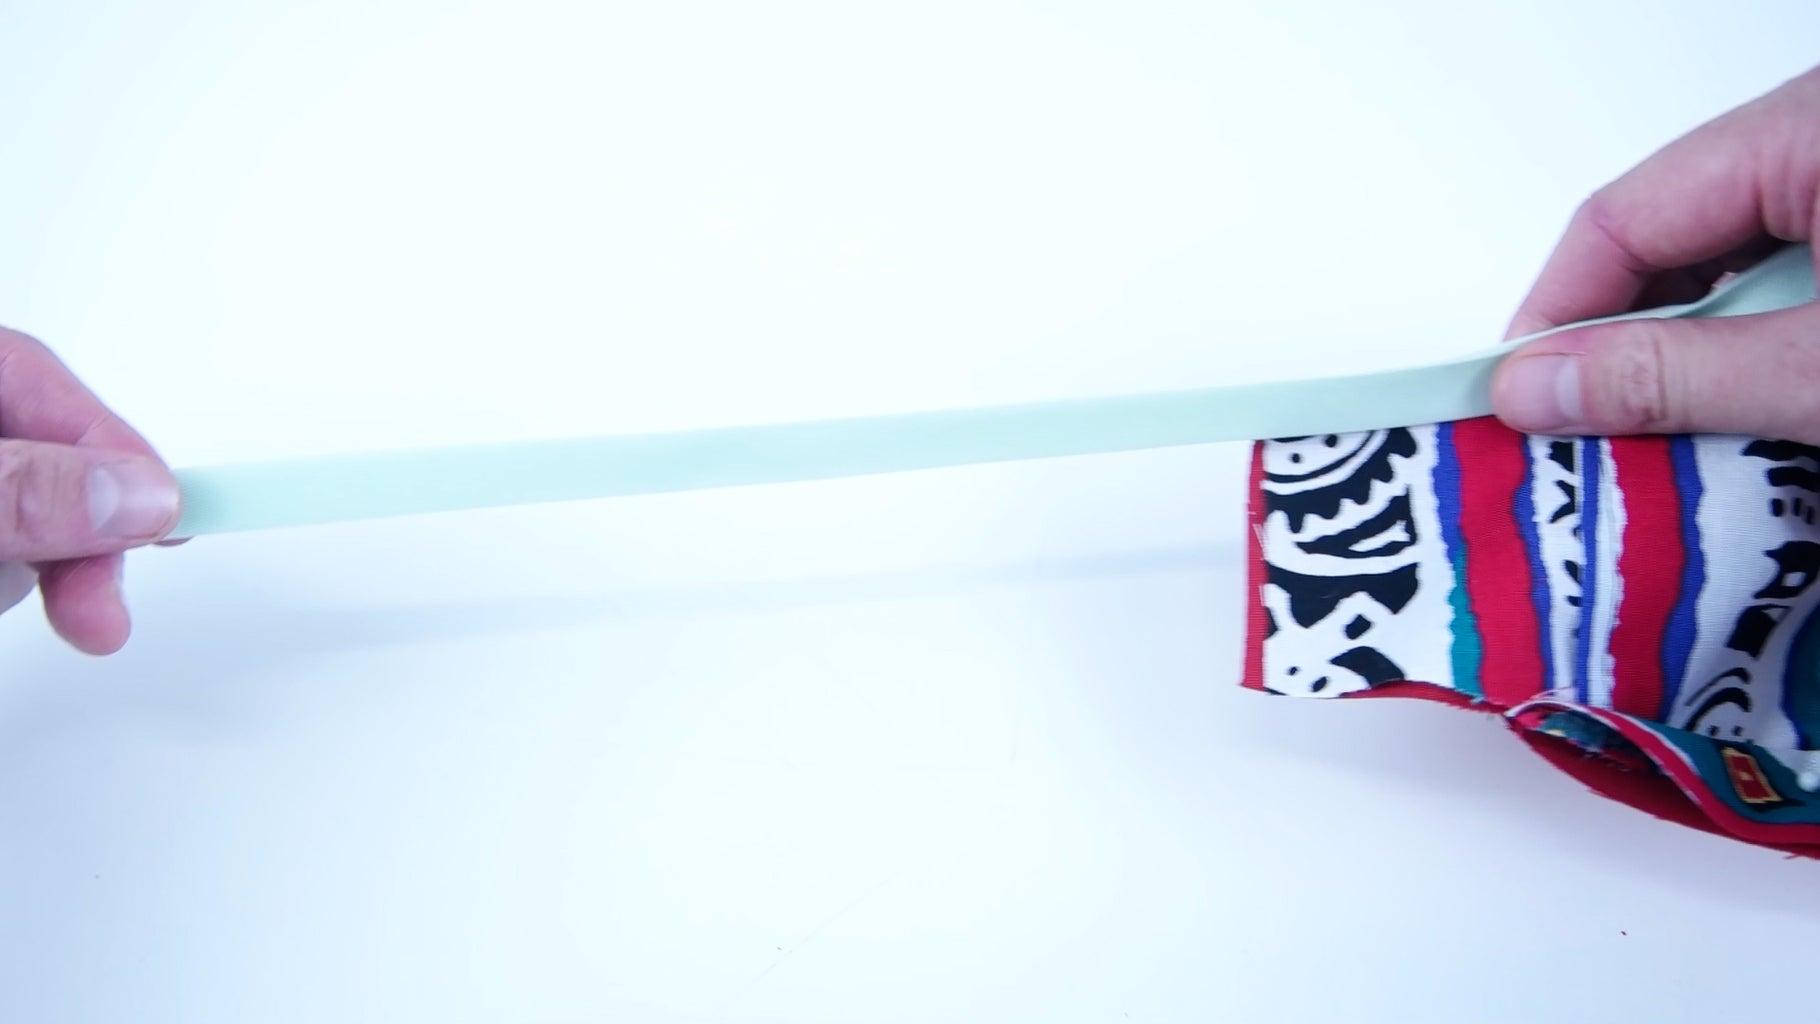 Bias Tape Top and Bottom Edge (Premade Bias Tape Method)